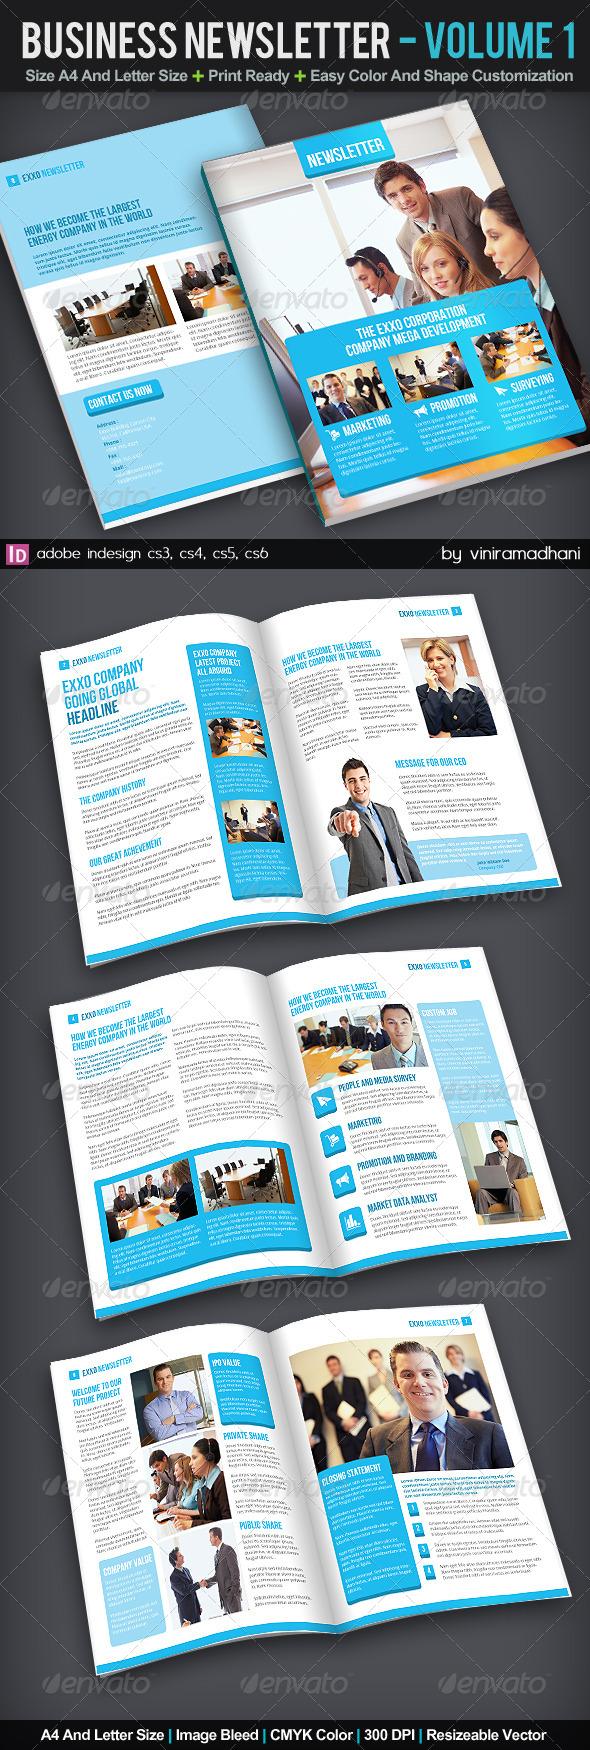 Business Newsletter | Volume 1 - Newsletters Print Templates